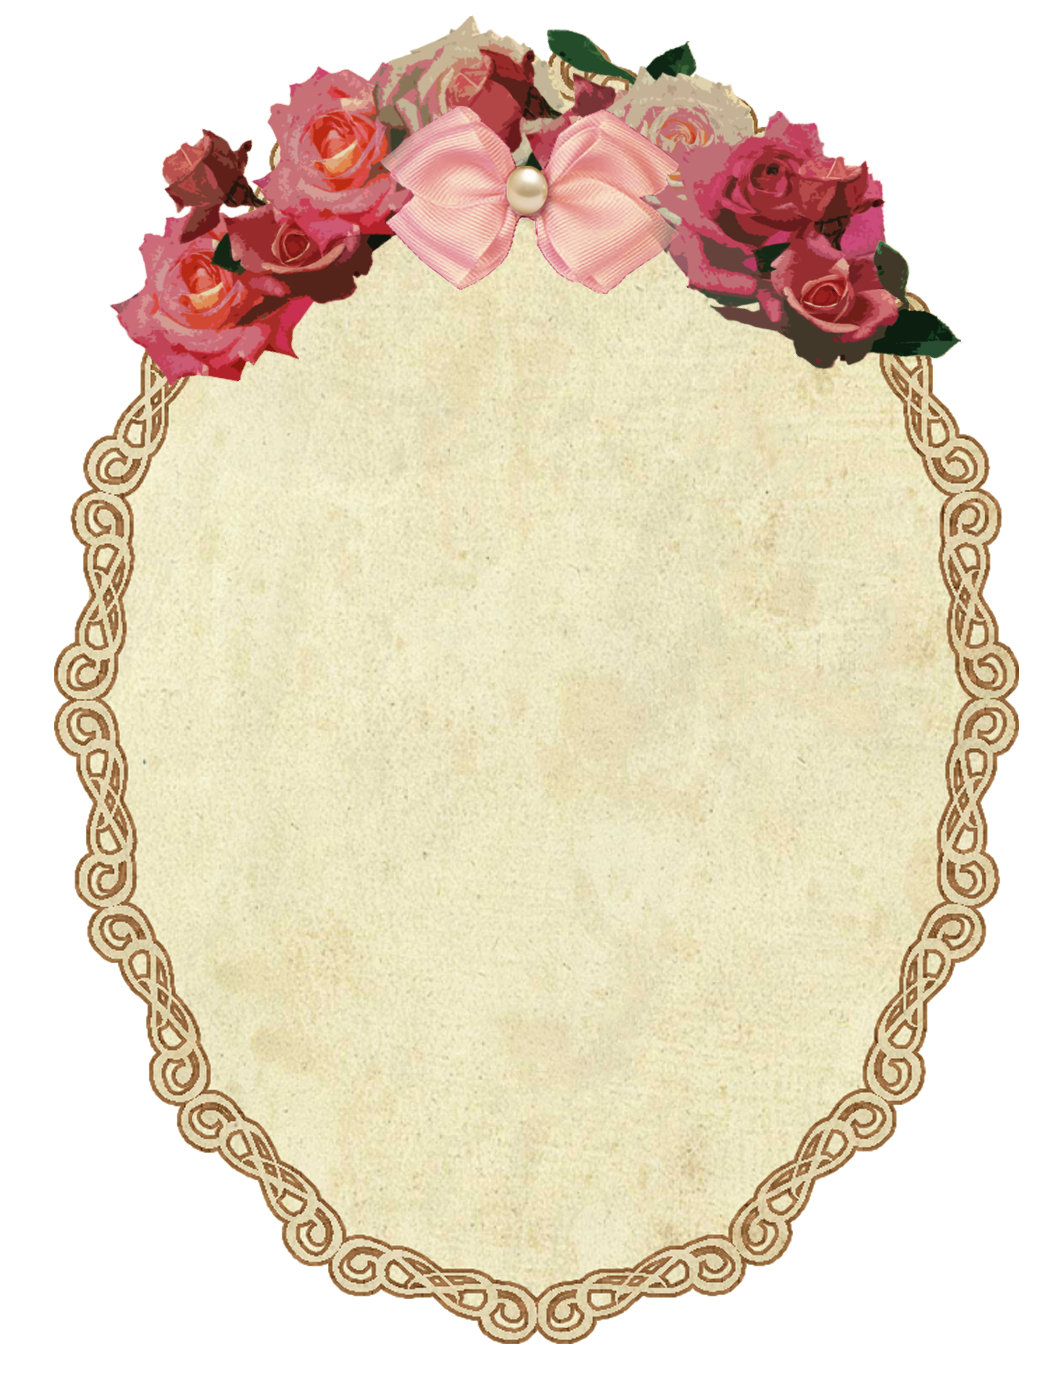 1000 1 FREE GRAPHICS : 7 Vintage Roses cliparts in PNG Transparent . - PNG Vintage